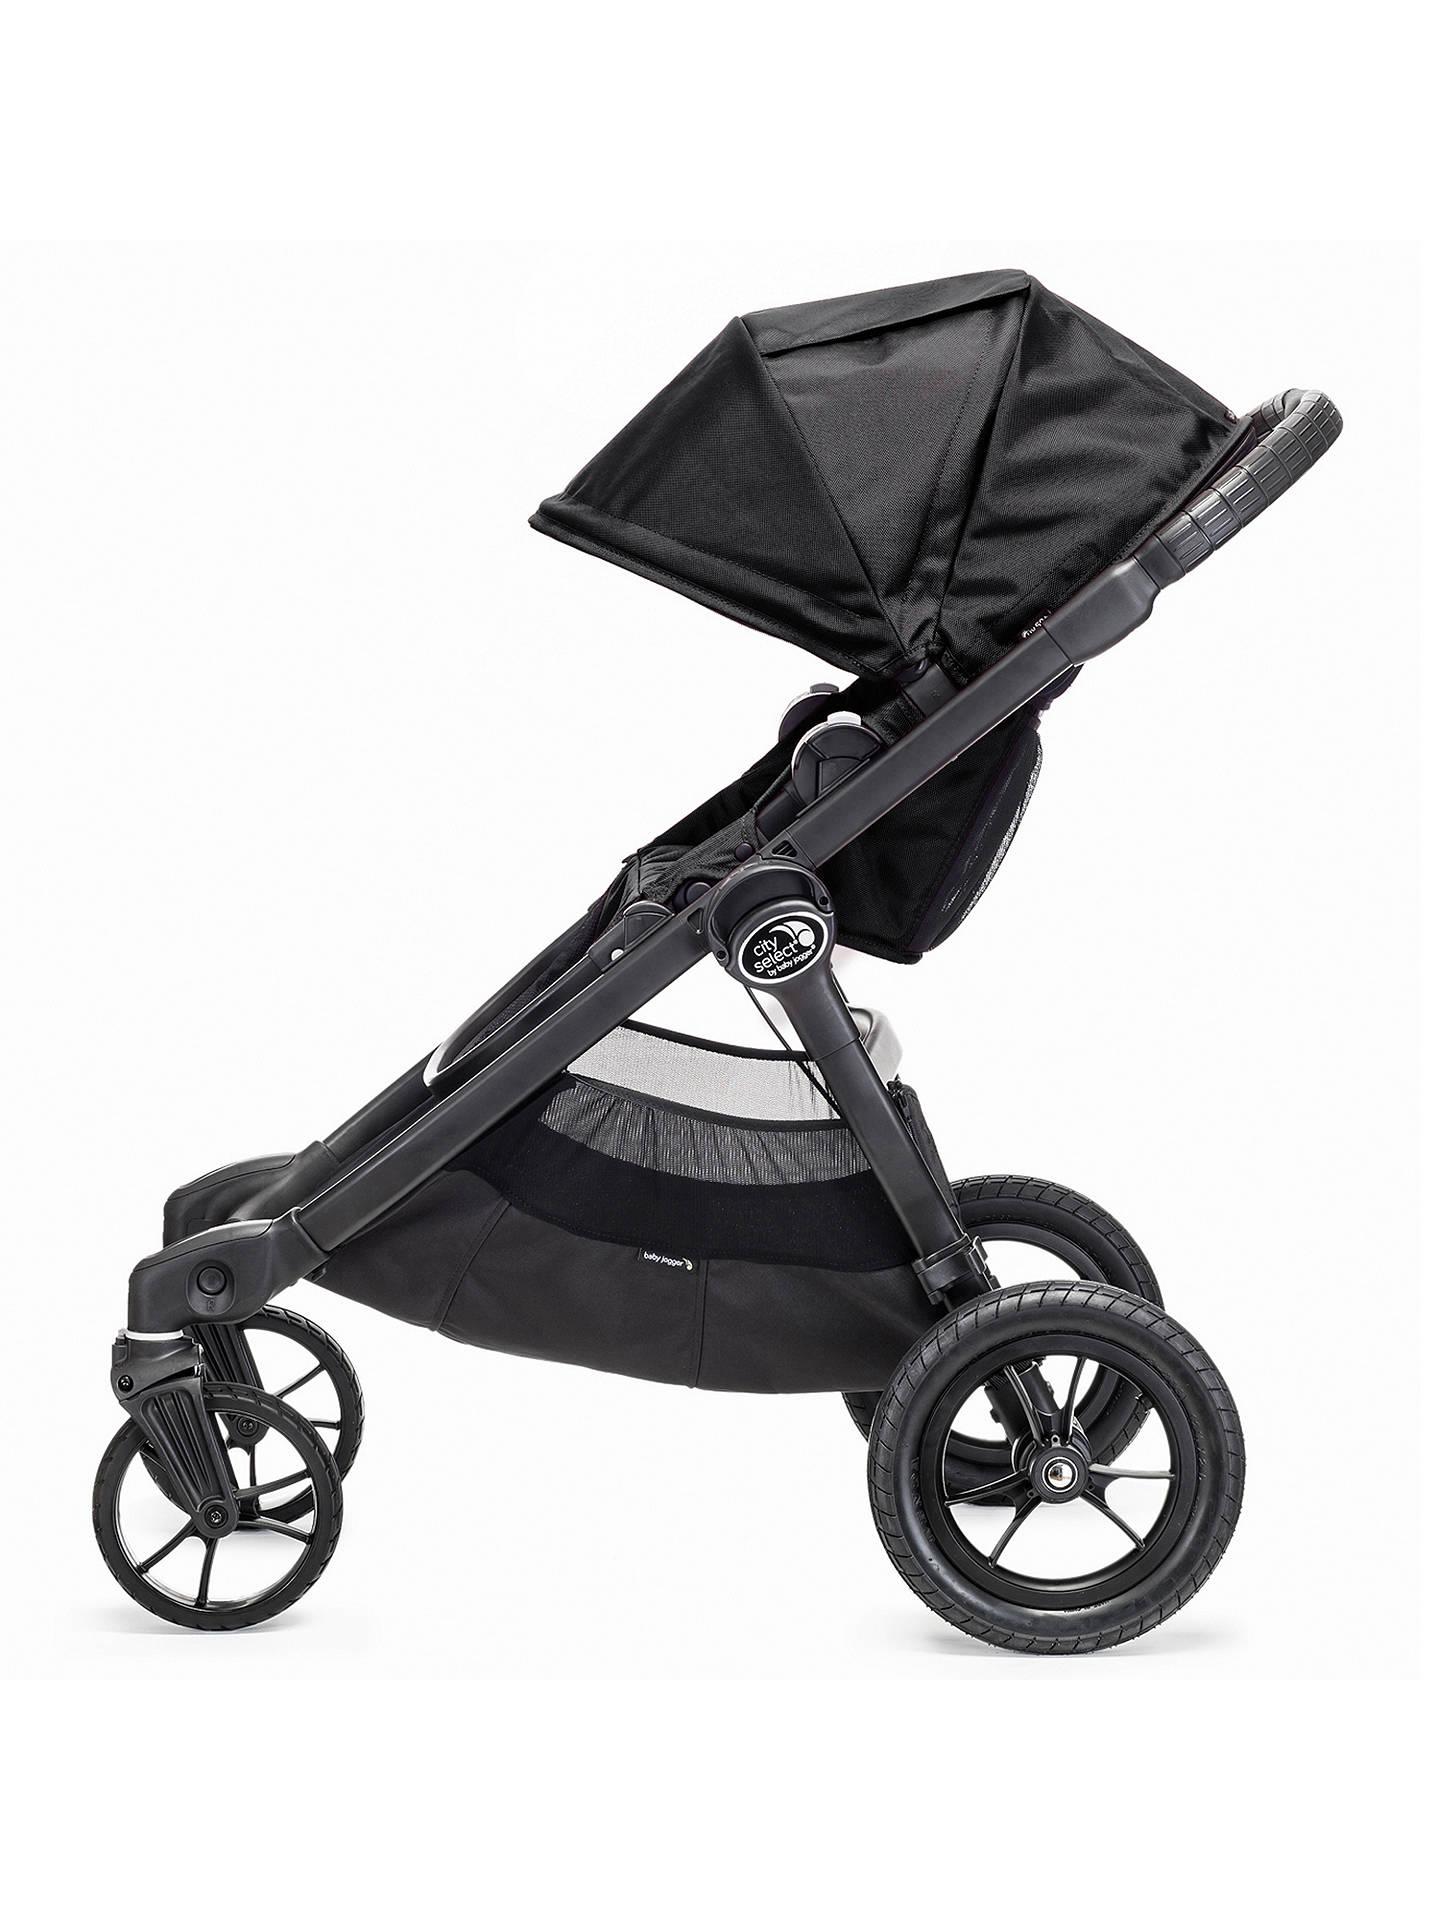 Baby Jogger City Select Pushchair Black At John Lewis